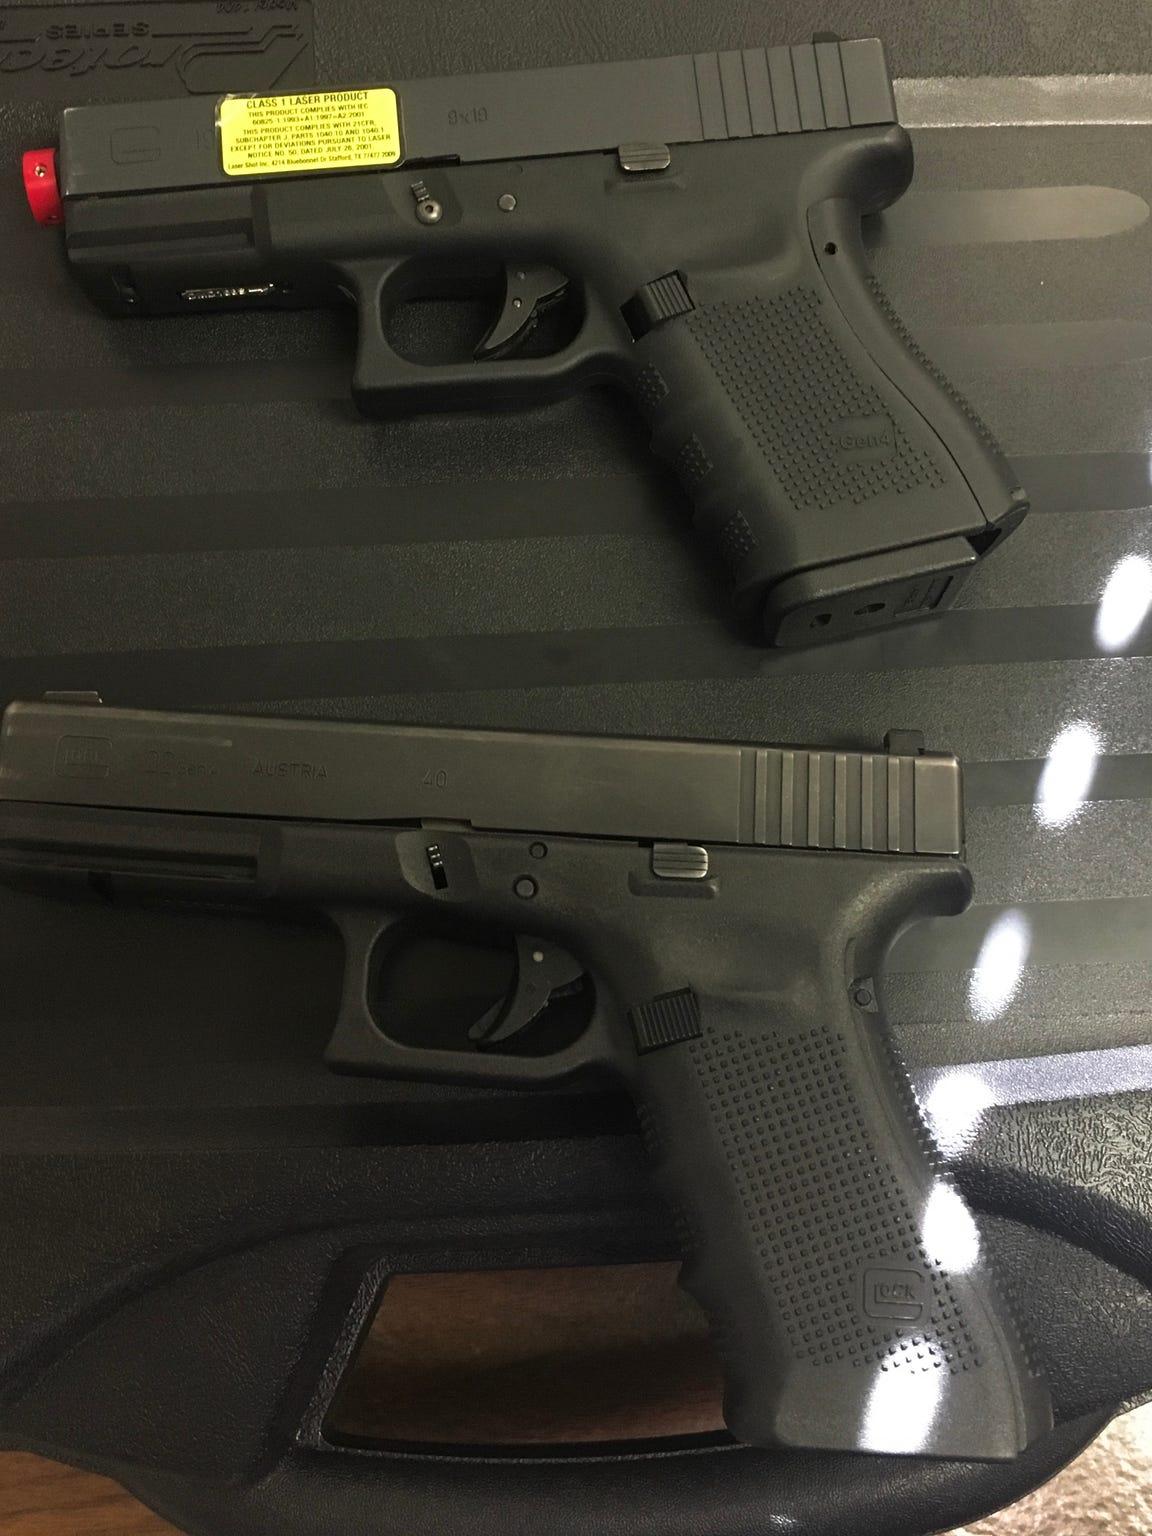 An image showing an imitation gun (top) compared to a real gun (bottom).